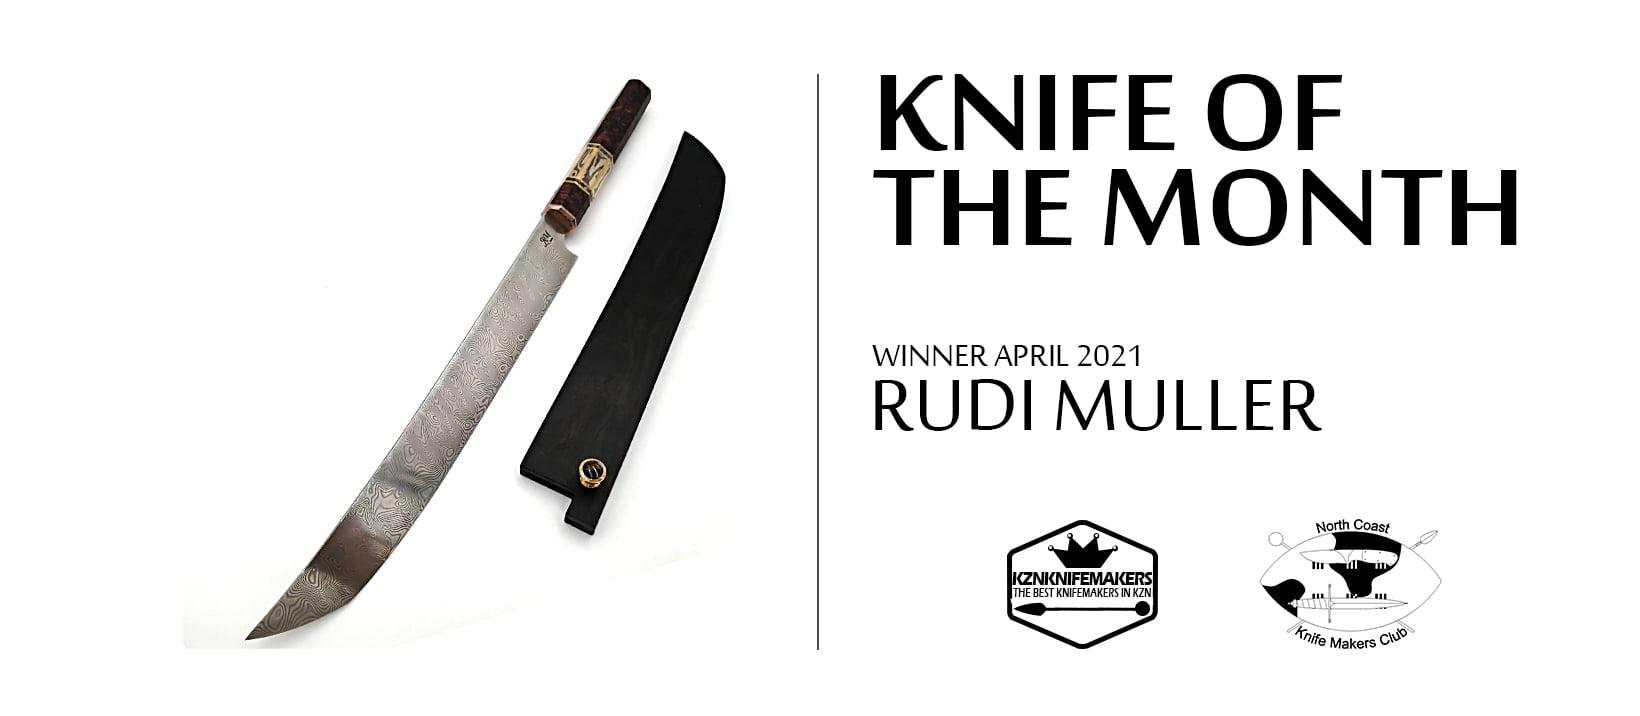 Knife of the Month Rudi Muller